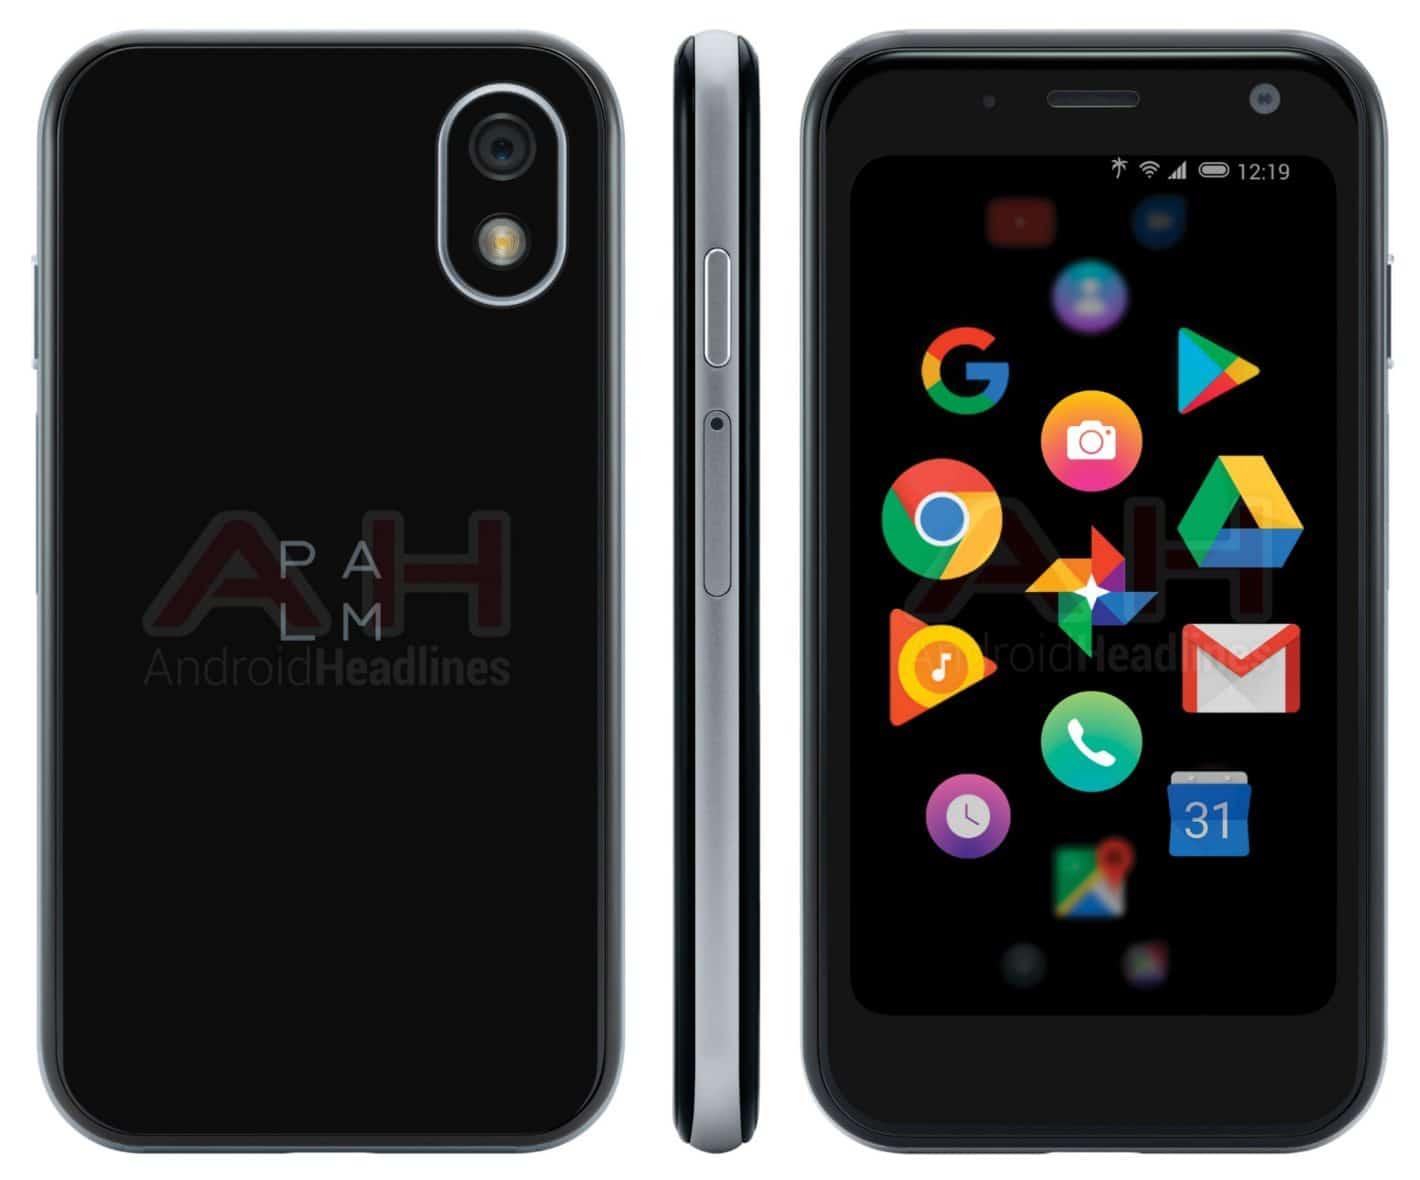 Palm Android Render Leak AH 01